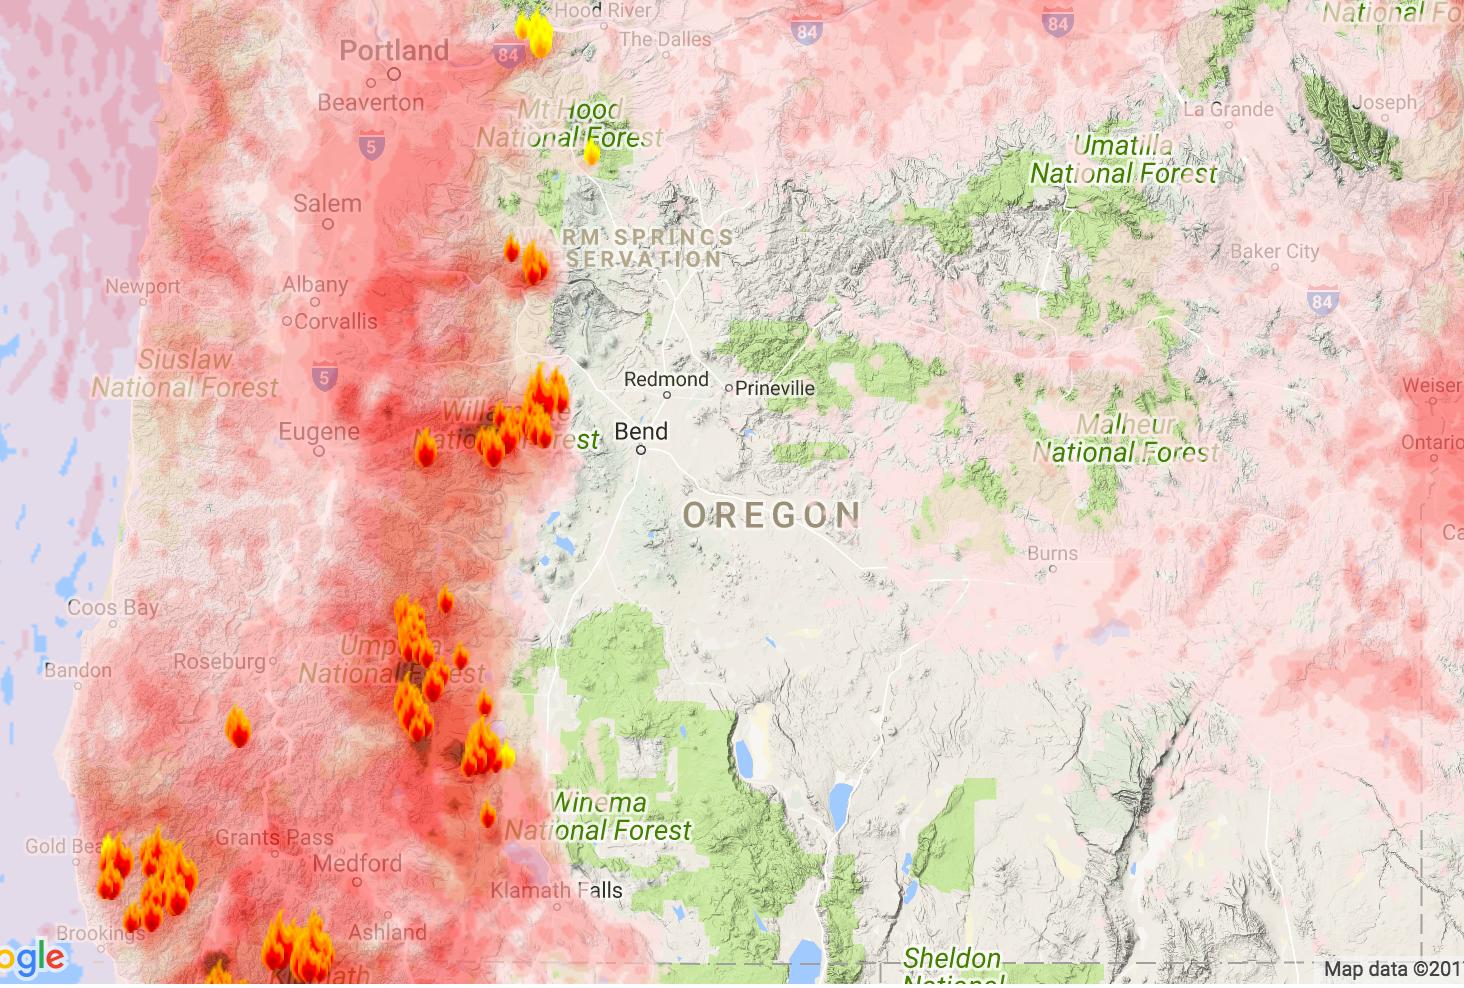 Oregon Smoke blogspot Labor Day model for average smoke conditions